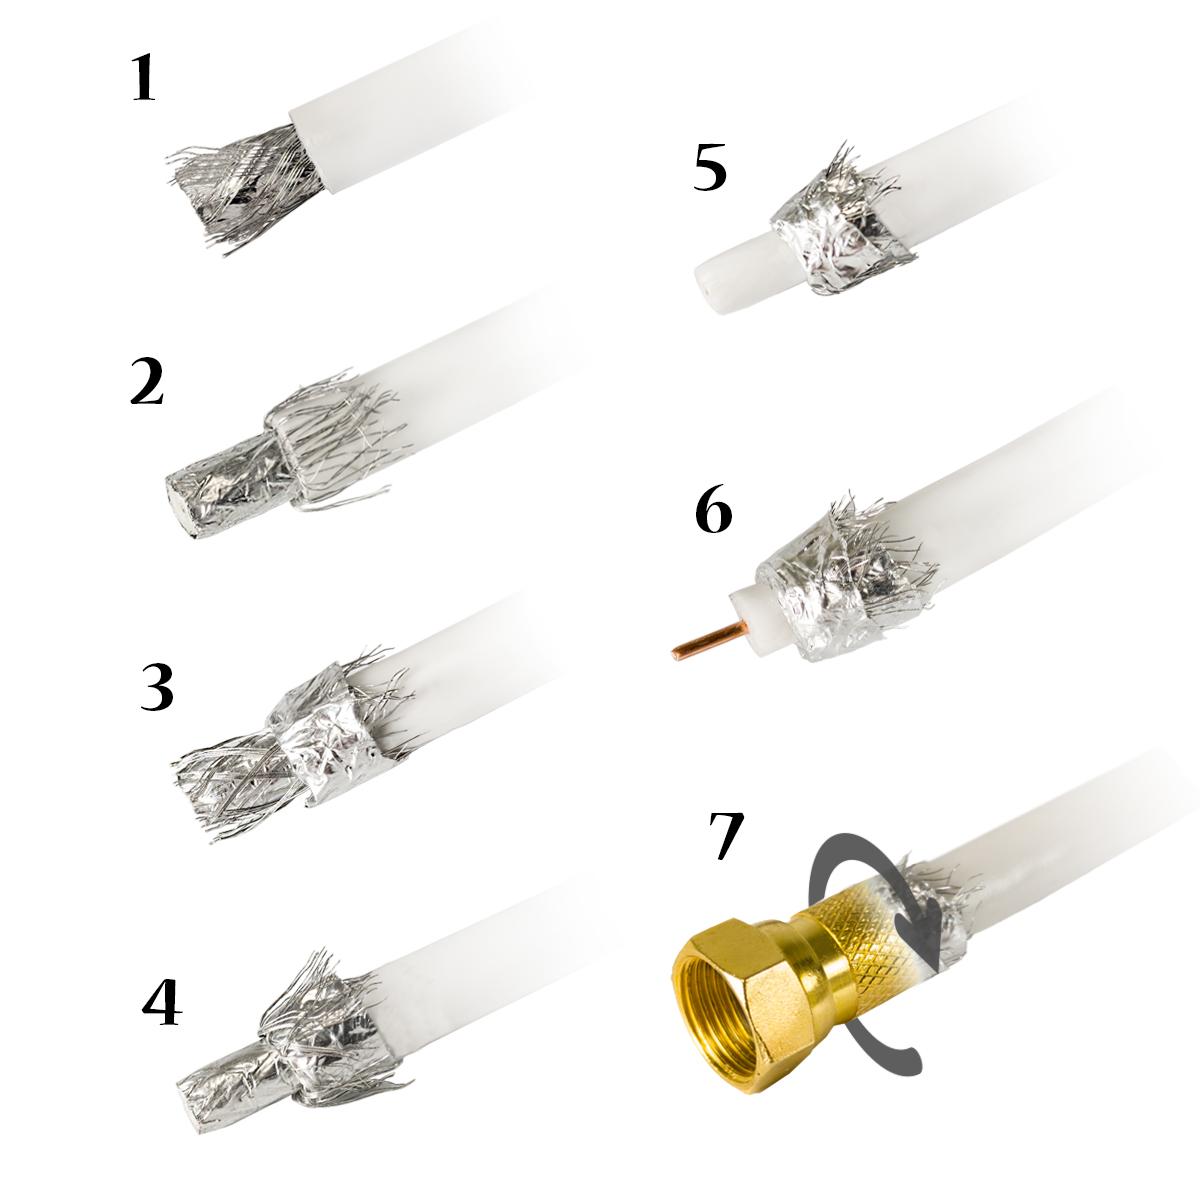 PremiumX BASIC 20m Koaxialkabel 135 dB 4-Fach geschirmt 20 m Kupfer-Stahl Satelliten Koaxkabel Antennenkabel Digital SAT TV Kabel